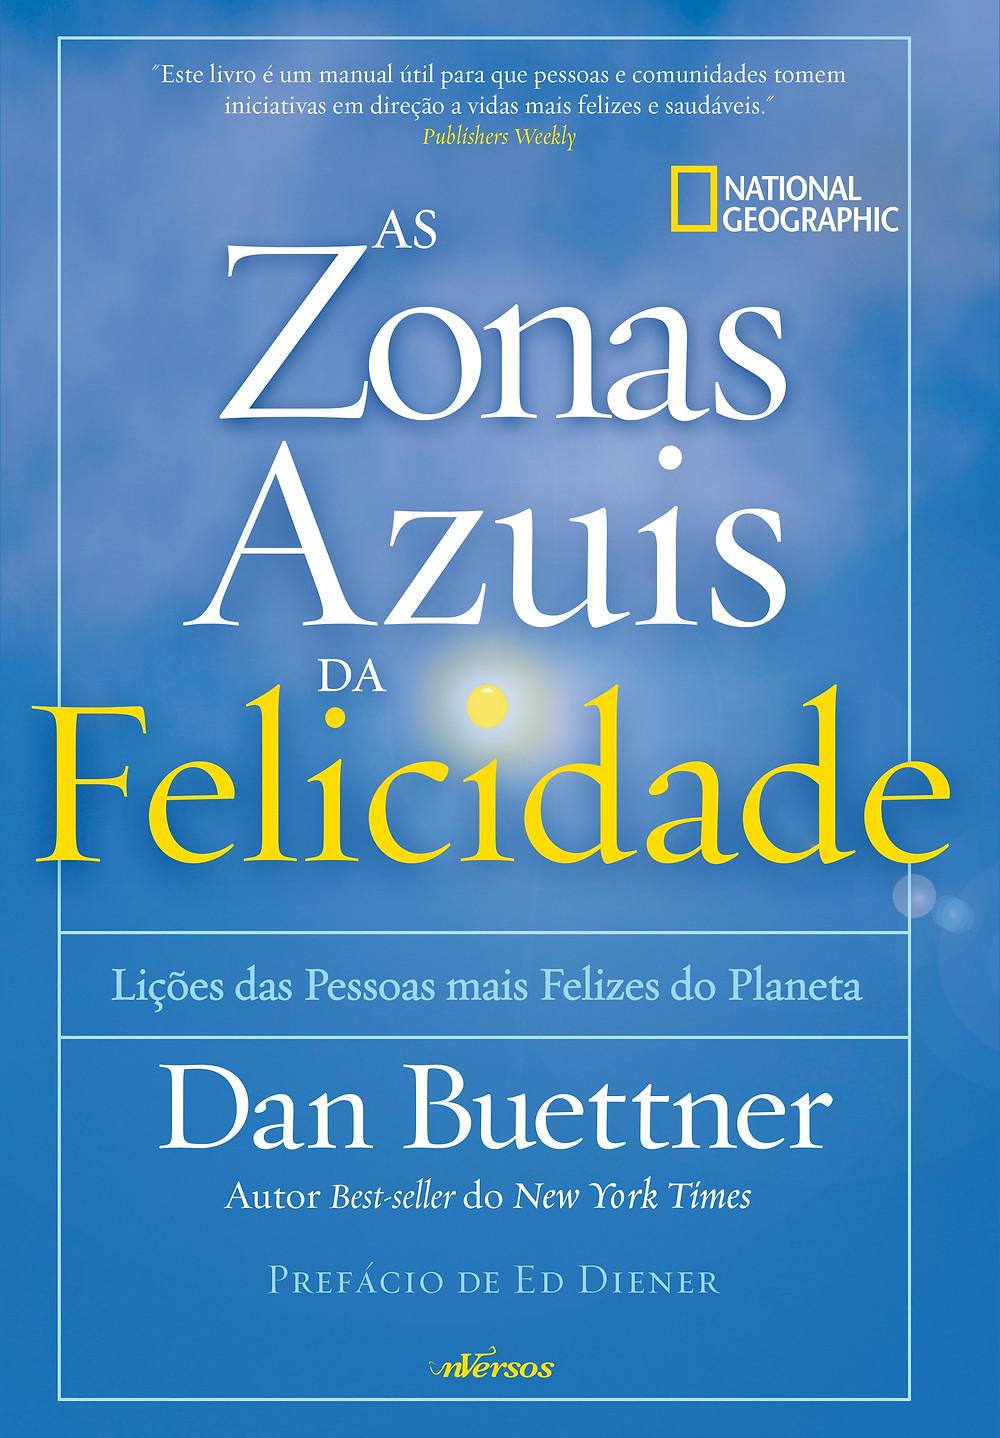 Livro Zonas Azuis da Felicidade